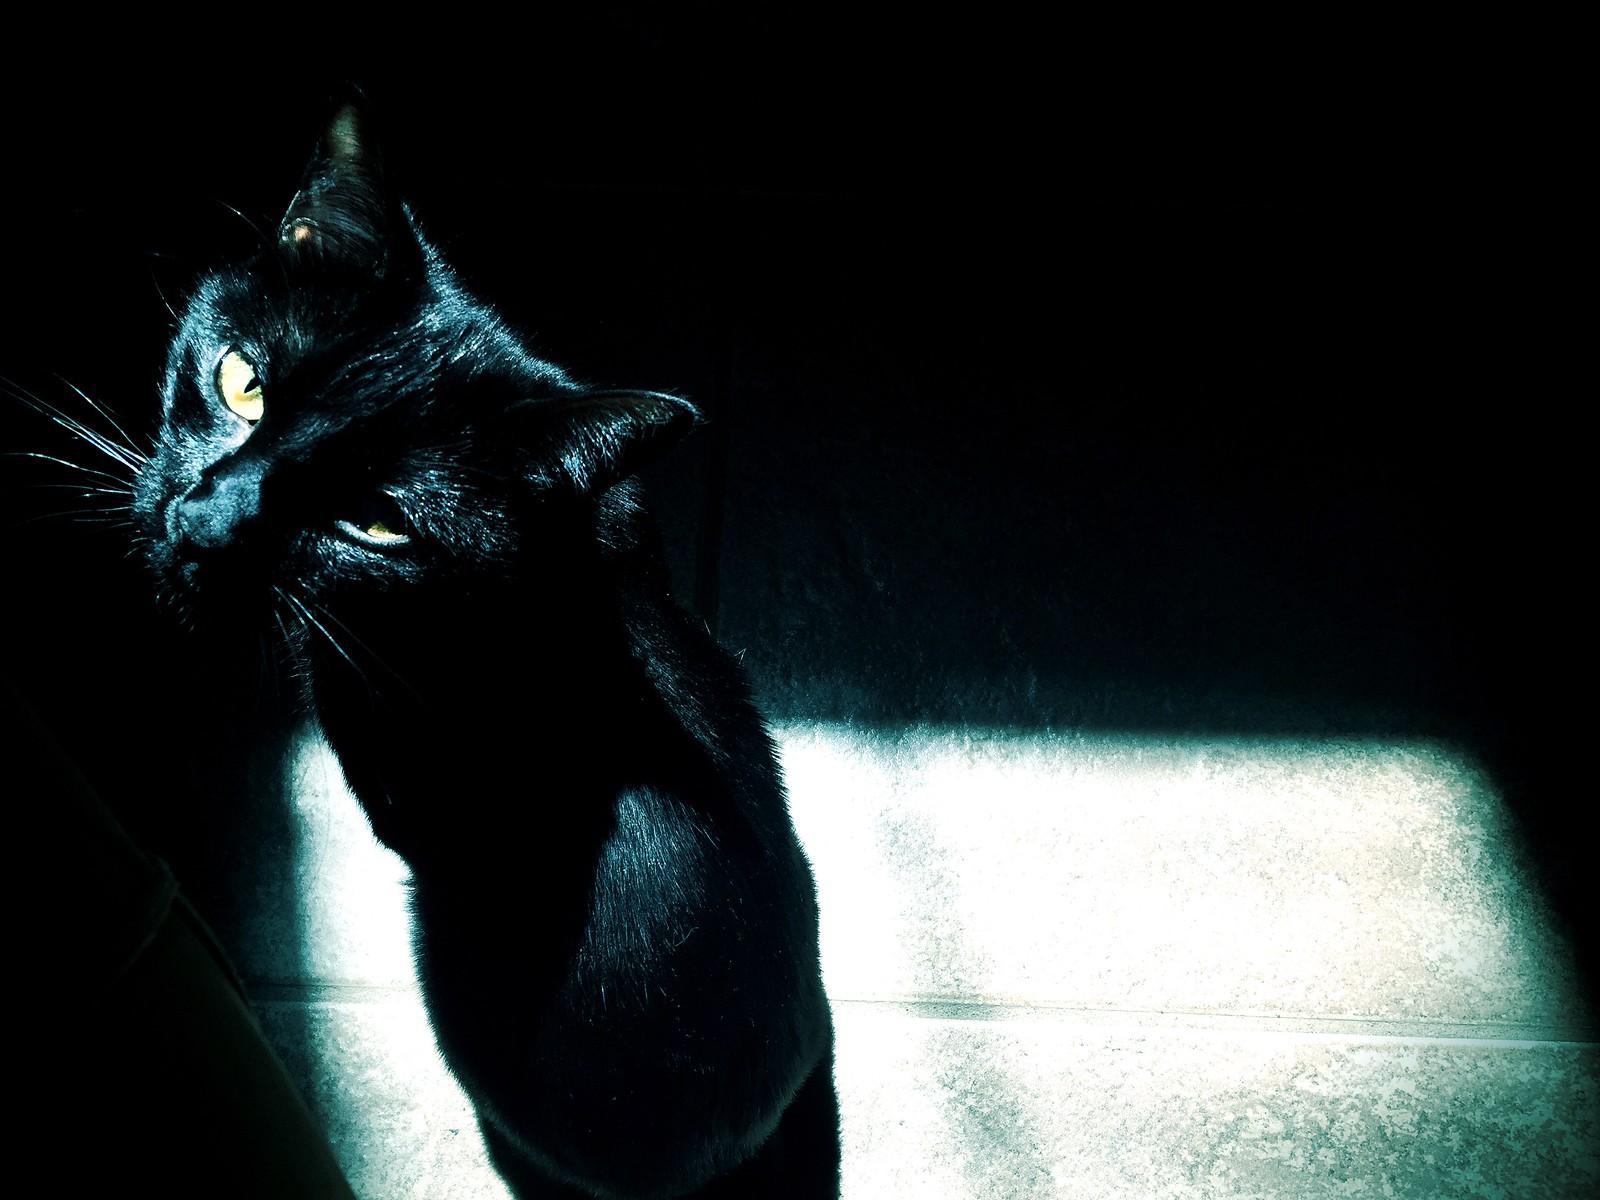 Kitty Noire